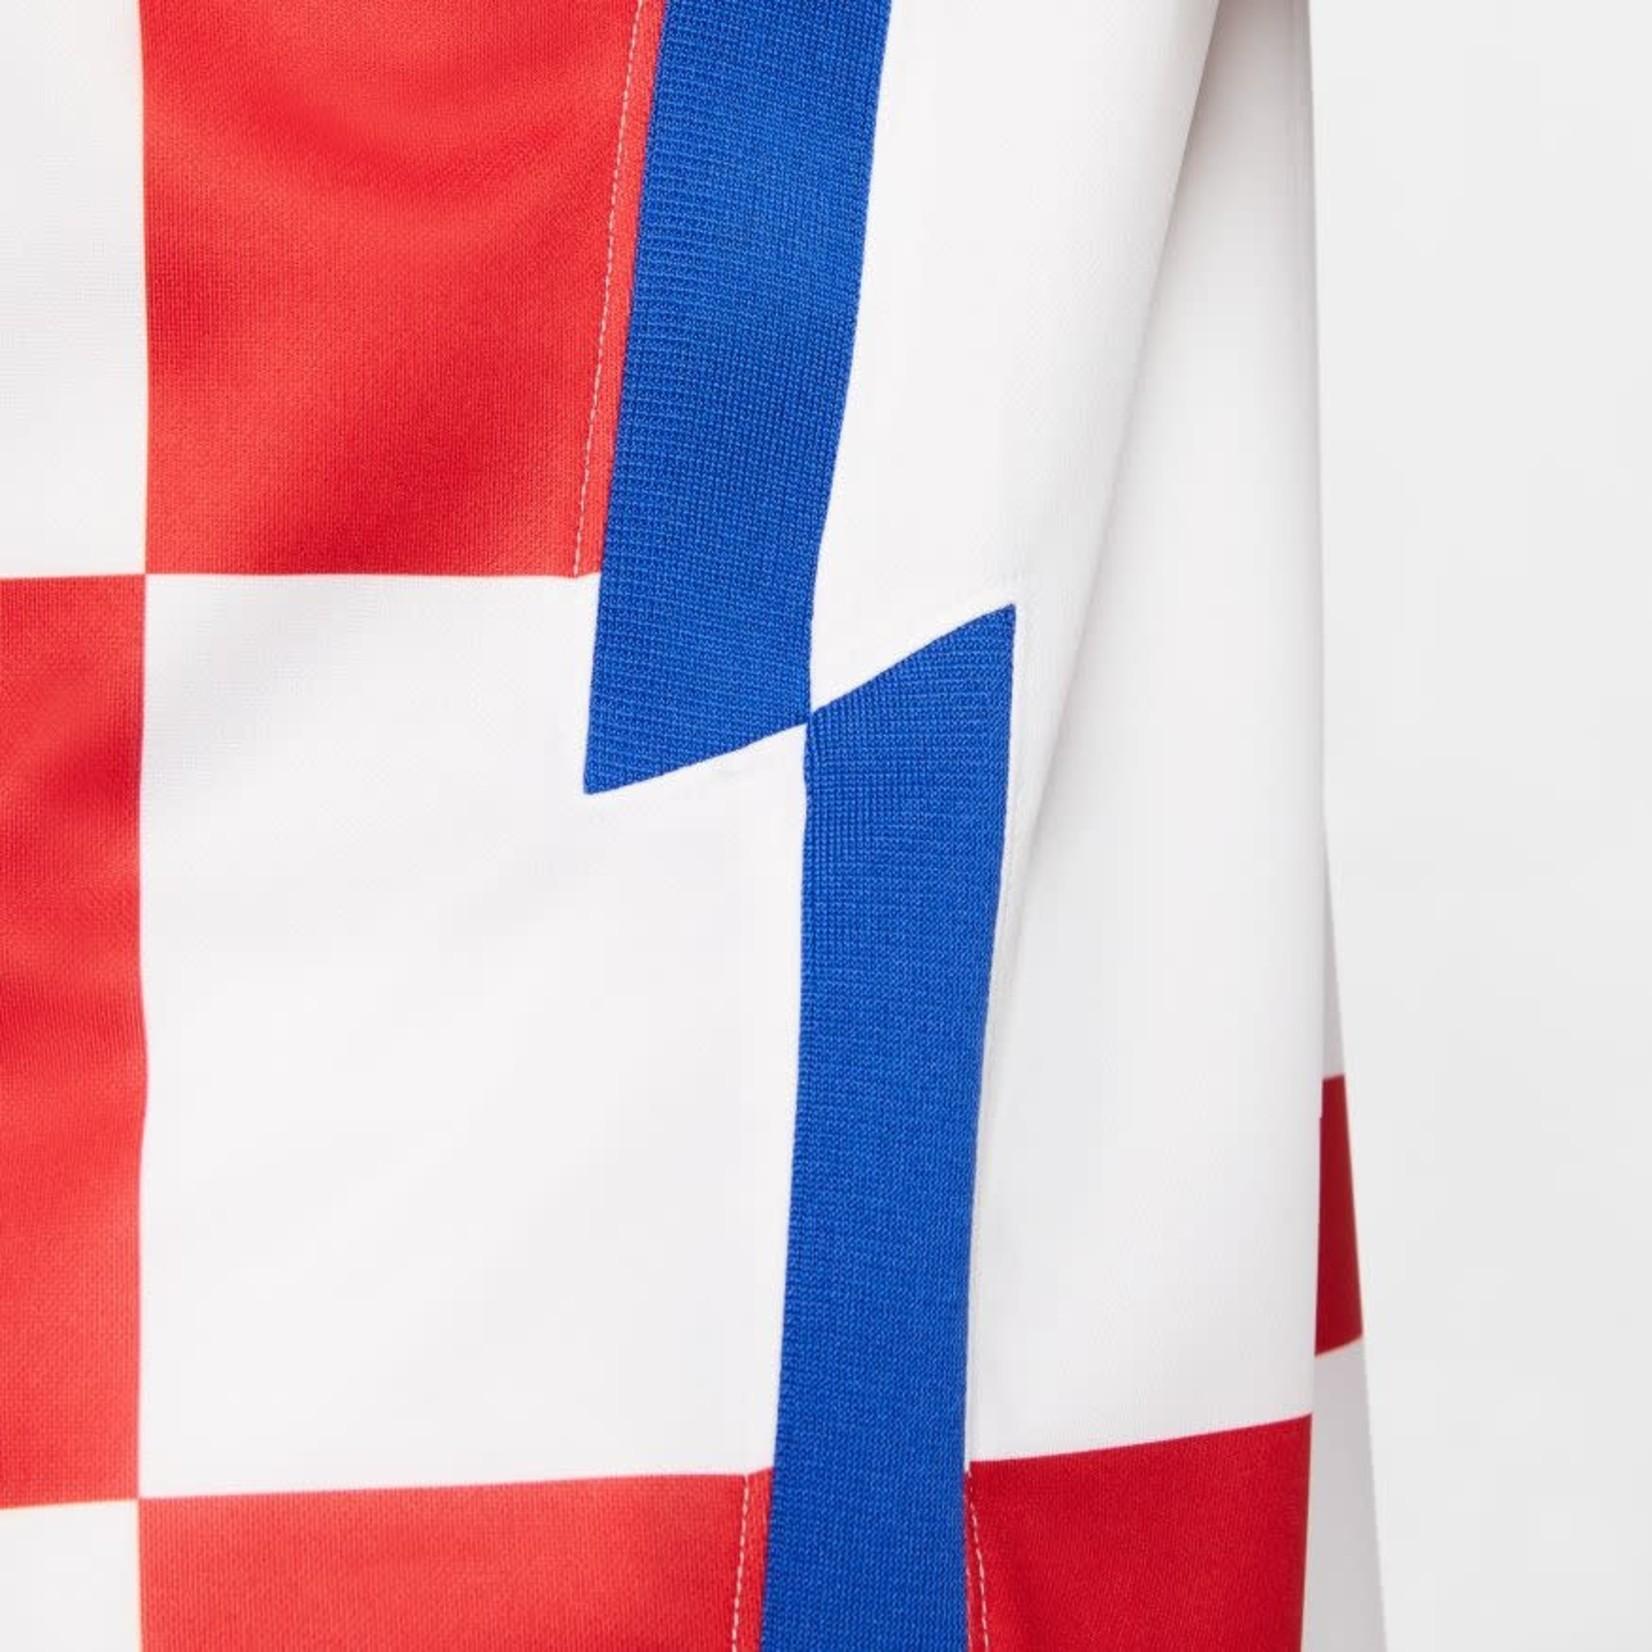 NIKE CROATIA 2020 HOME JERSEY